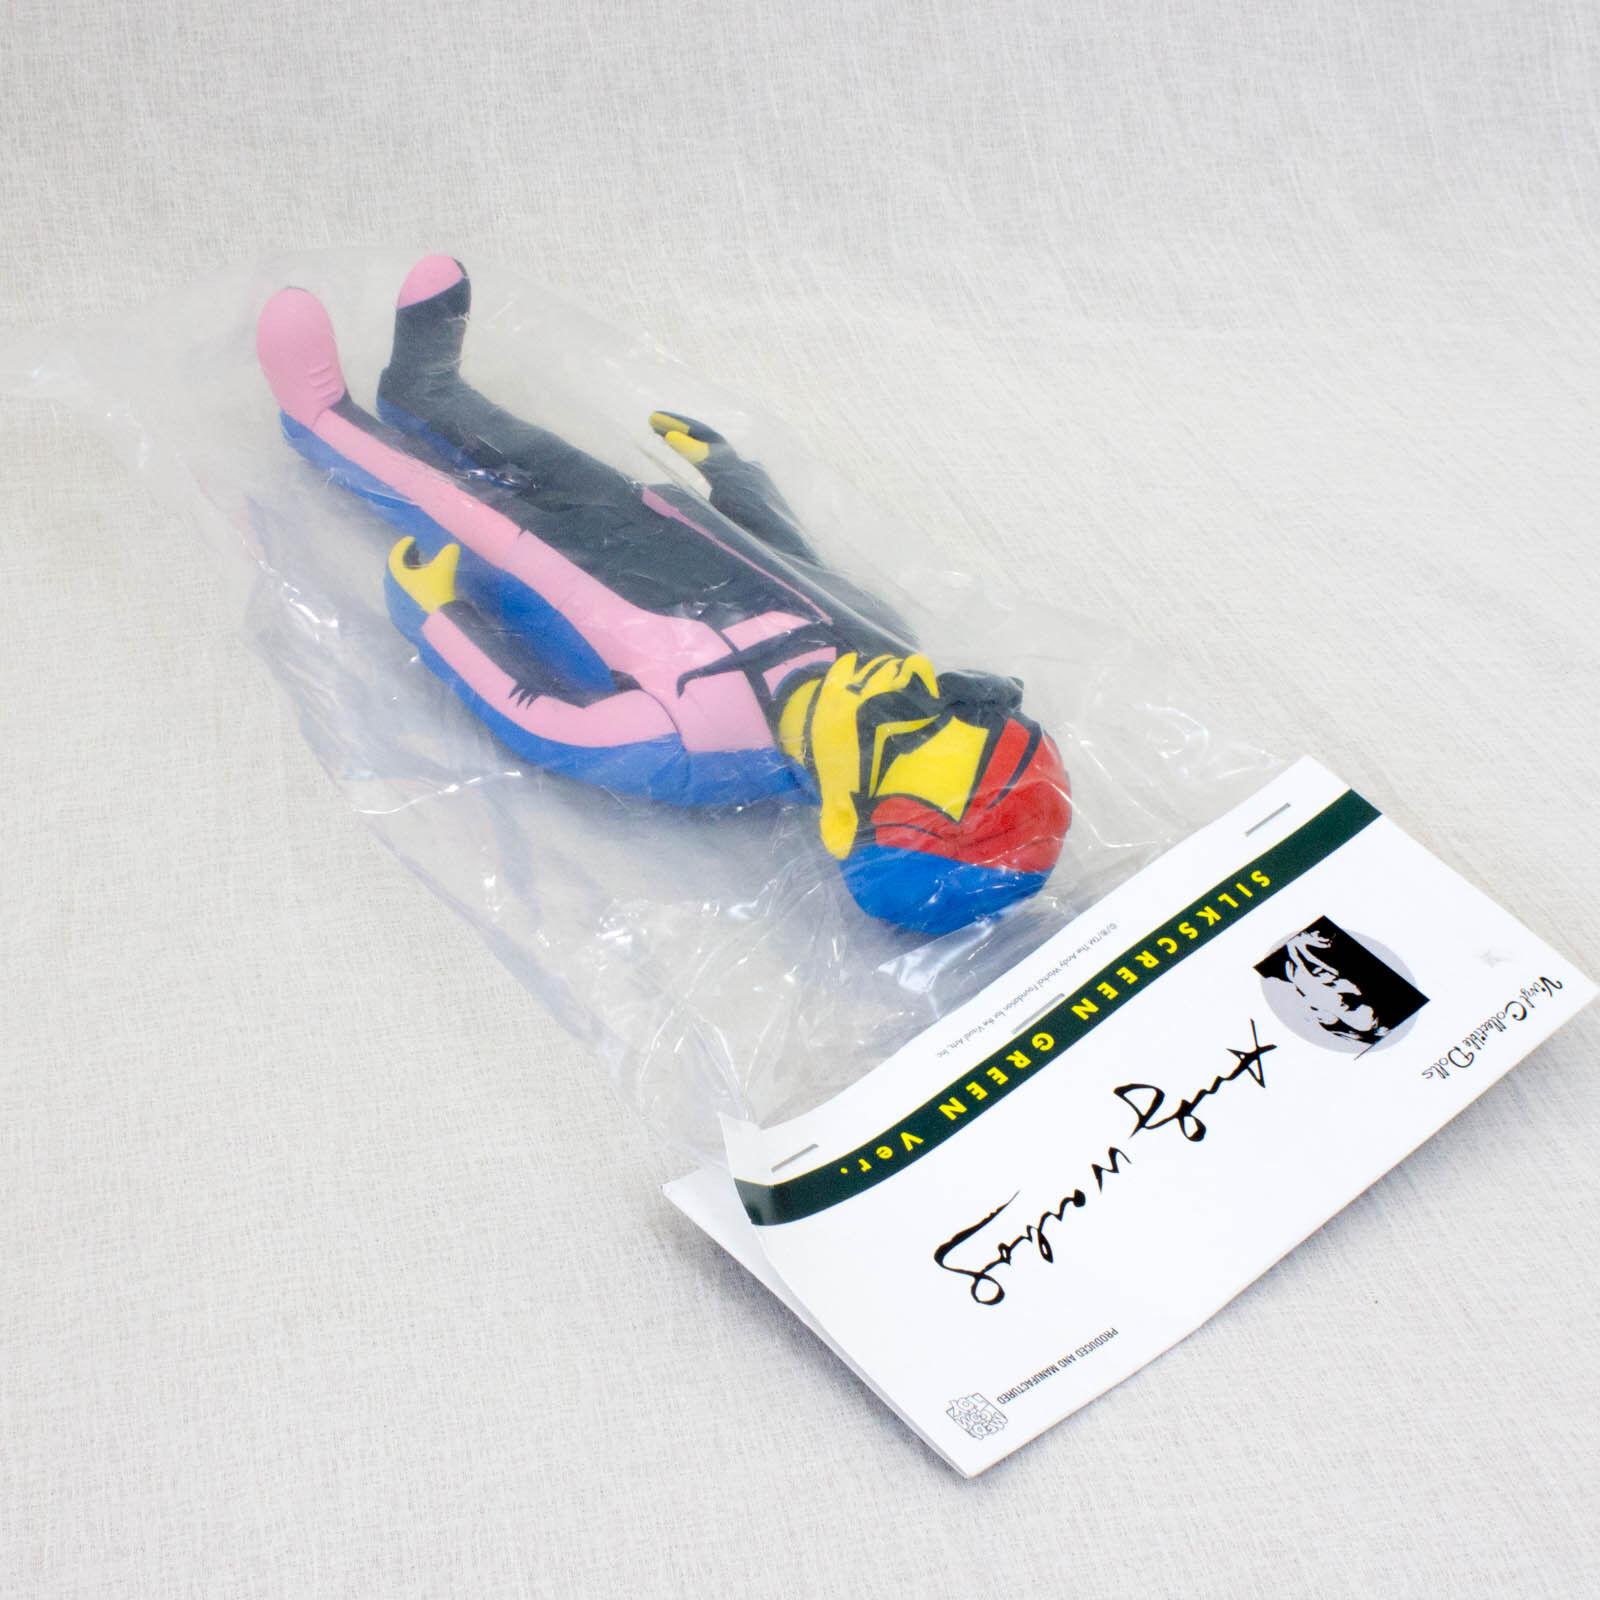 ey Warhol Vinyl Silkscreen Silkscreen Silkscreen verde Ver.  cifra Medicom giocattolo VCD JAPAN f7cb67